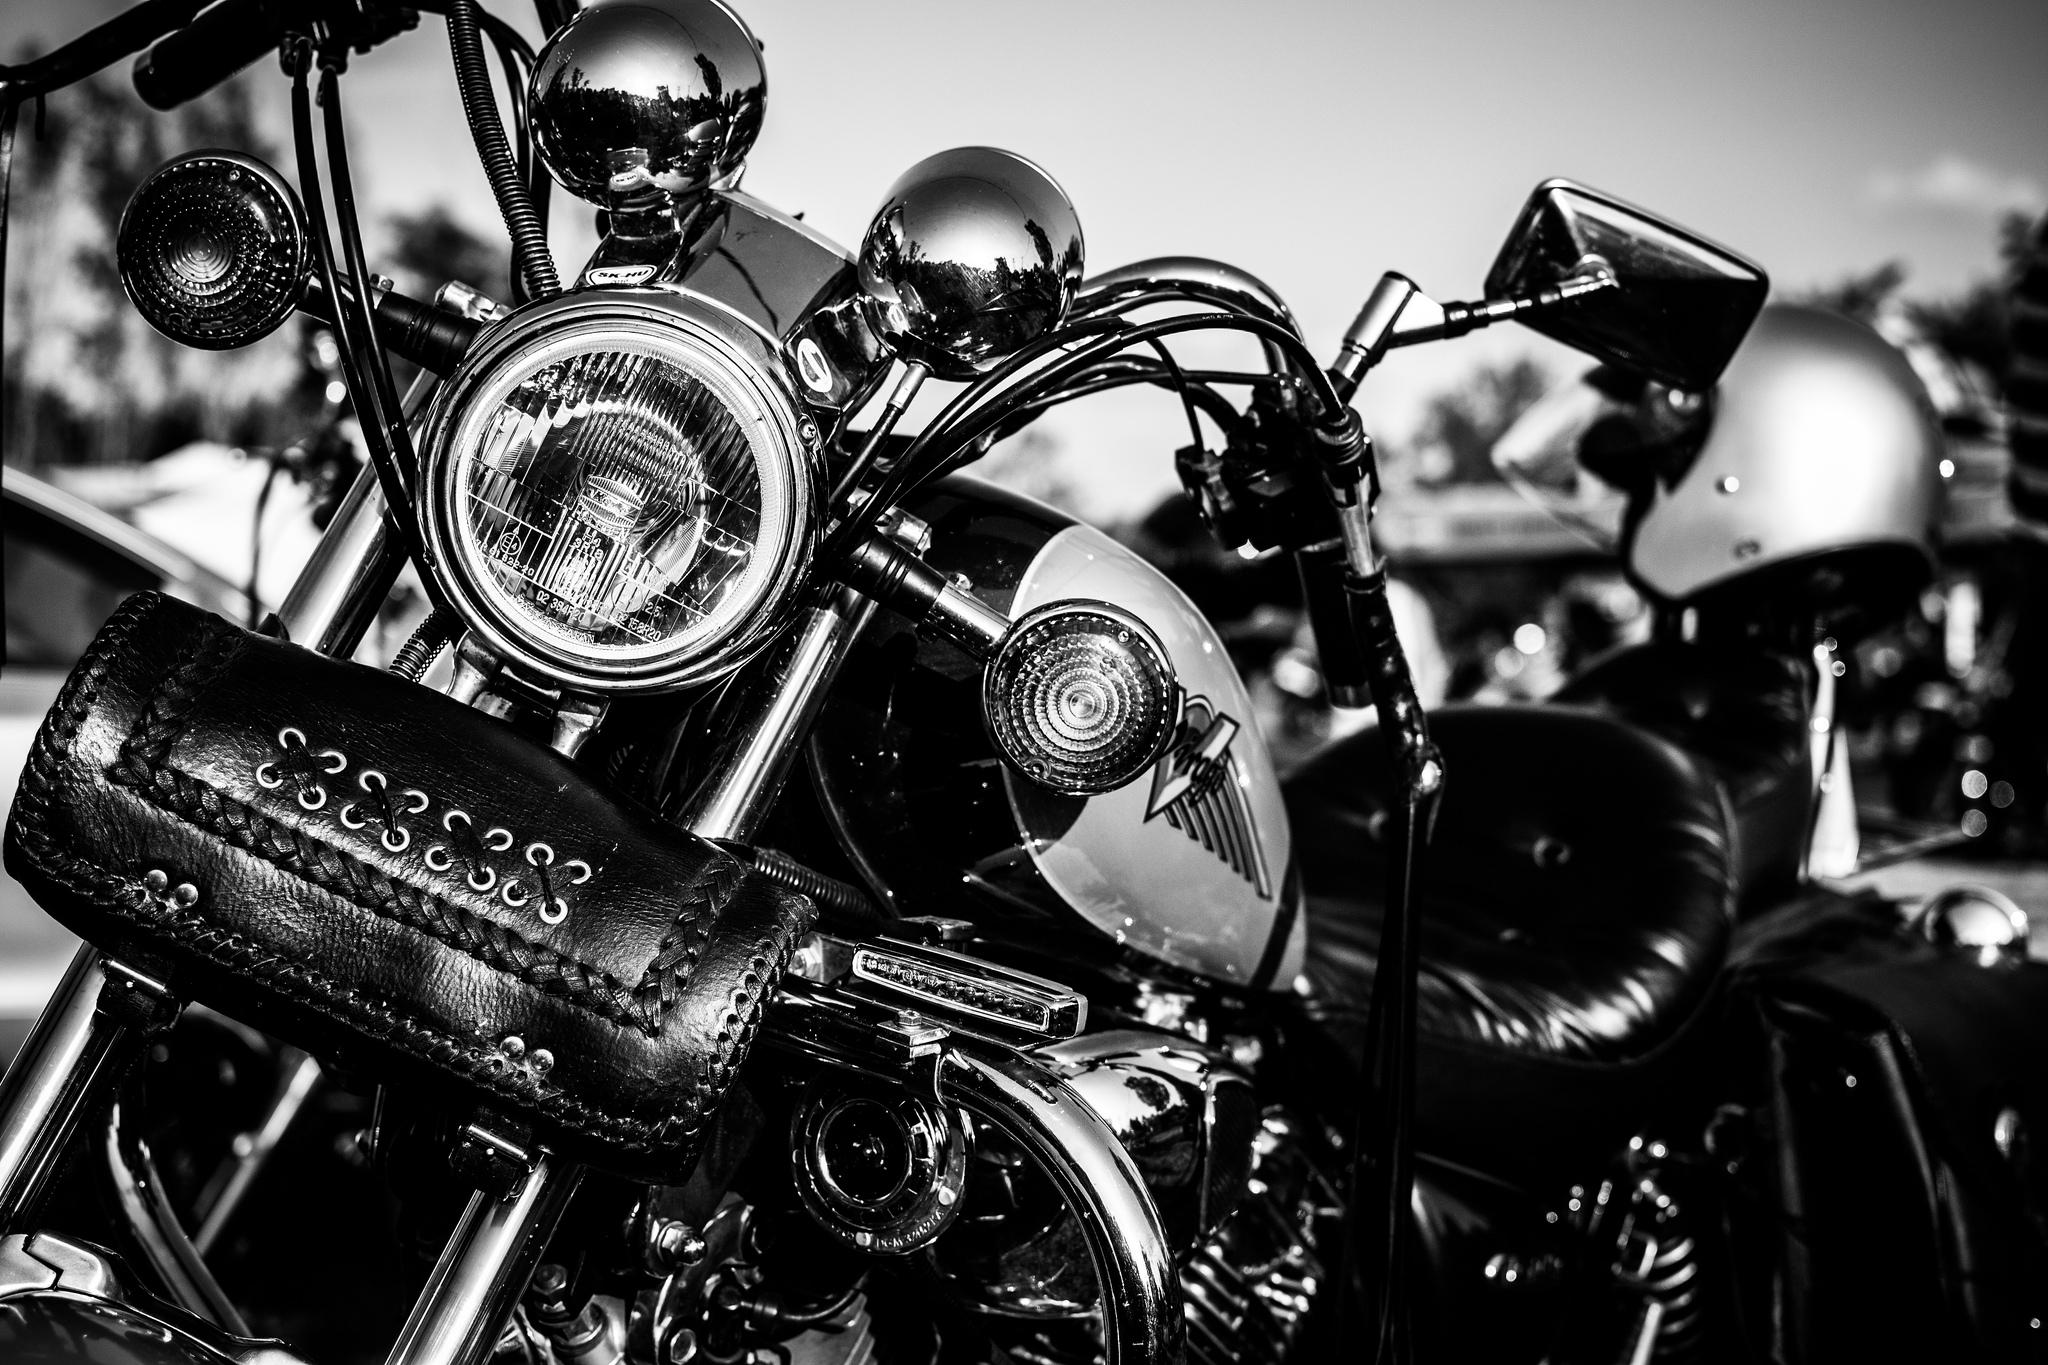 Harley Davidson Wallpaper HD 2048x1365